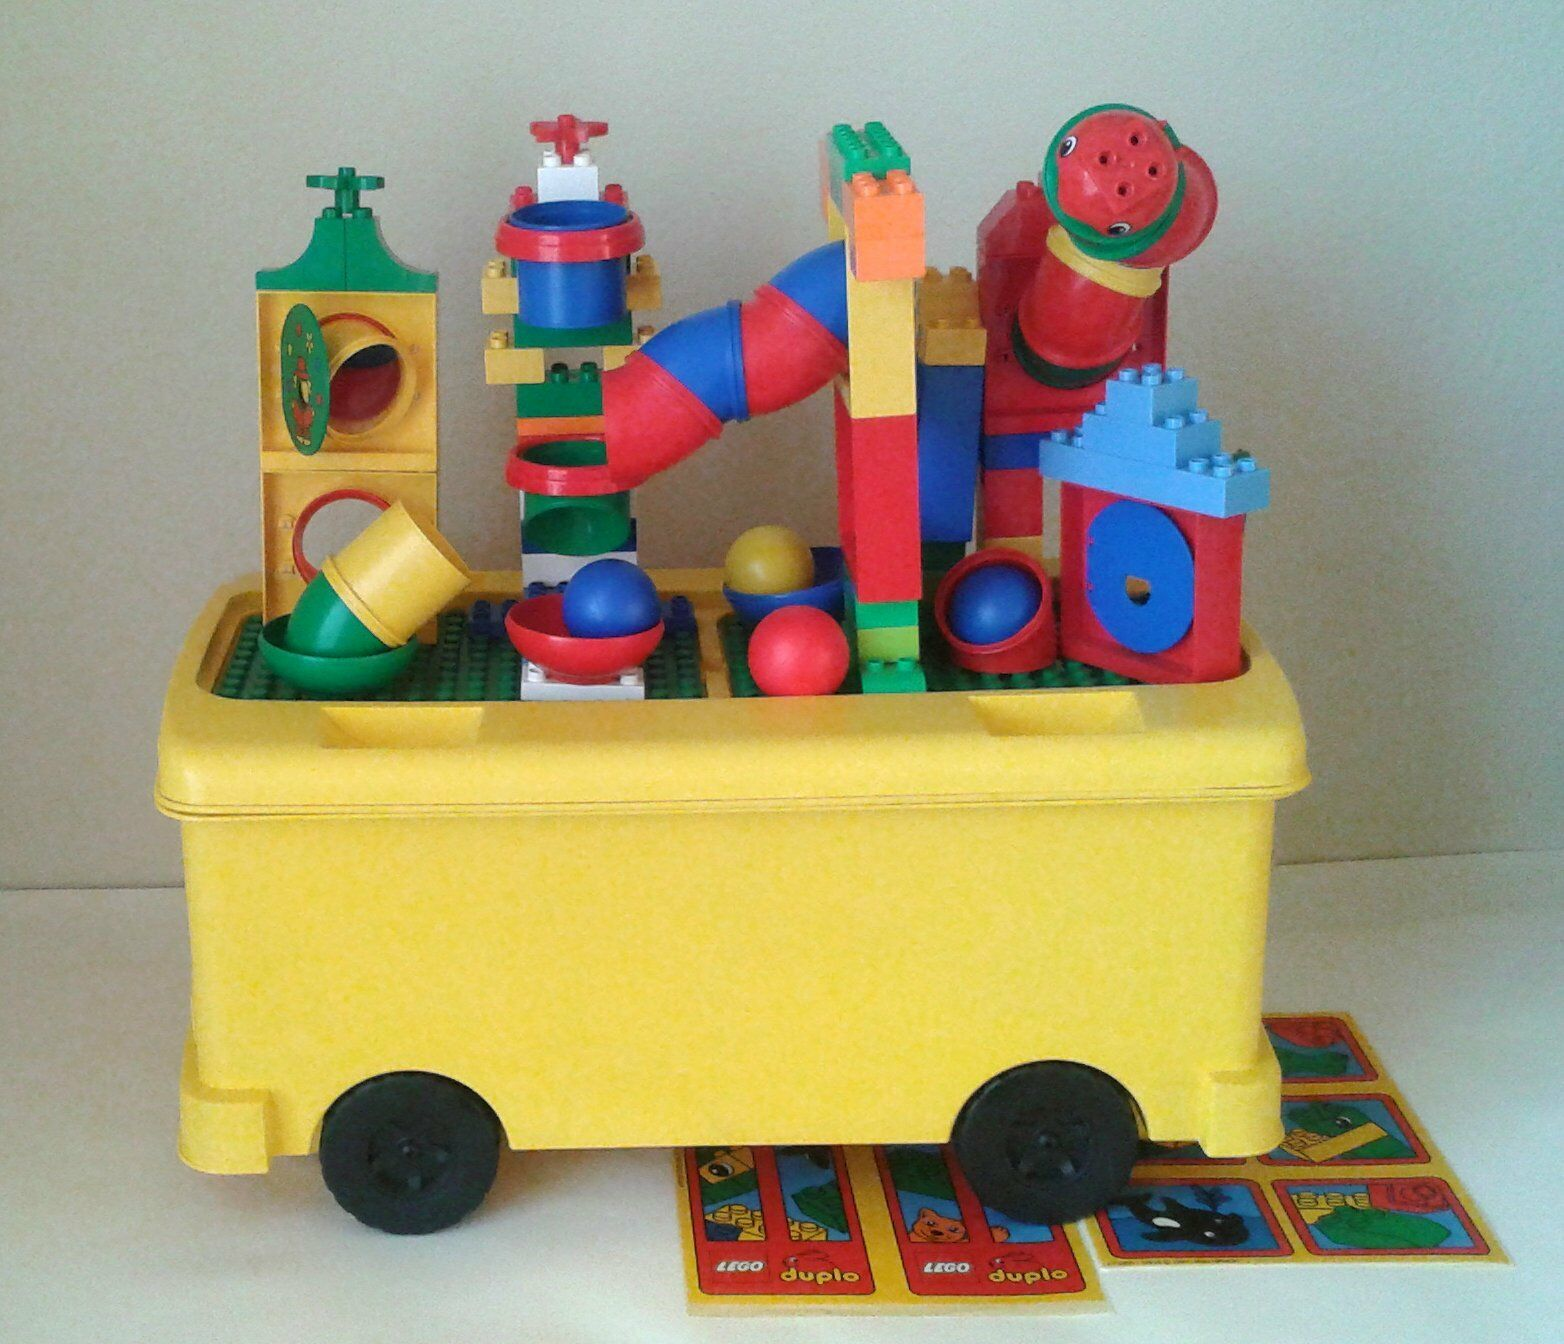 LEGO Duplo Tubes Lot +  2581 Animal autobus Ride-on Storage Bin gree with ruedas  risparmia fino al 30-50% di sconto